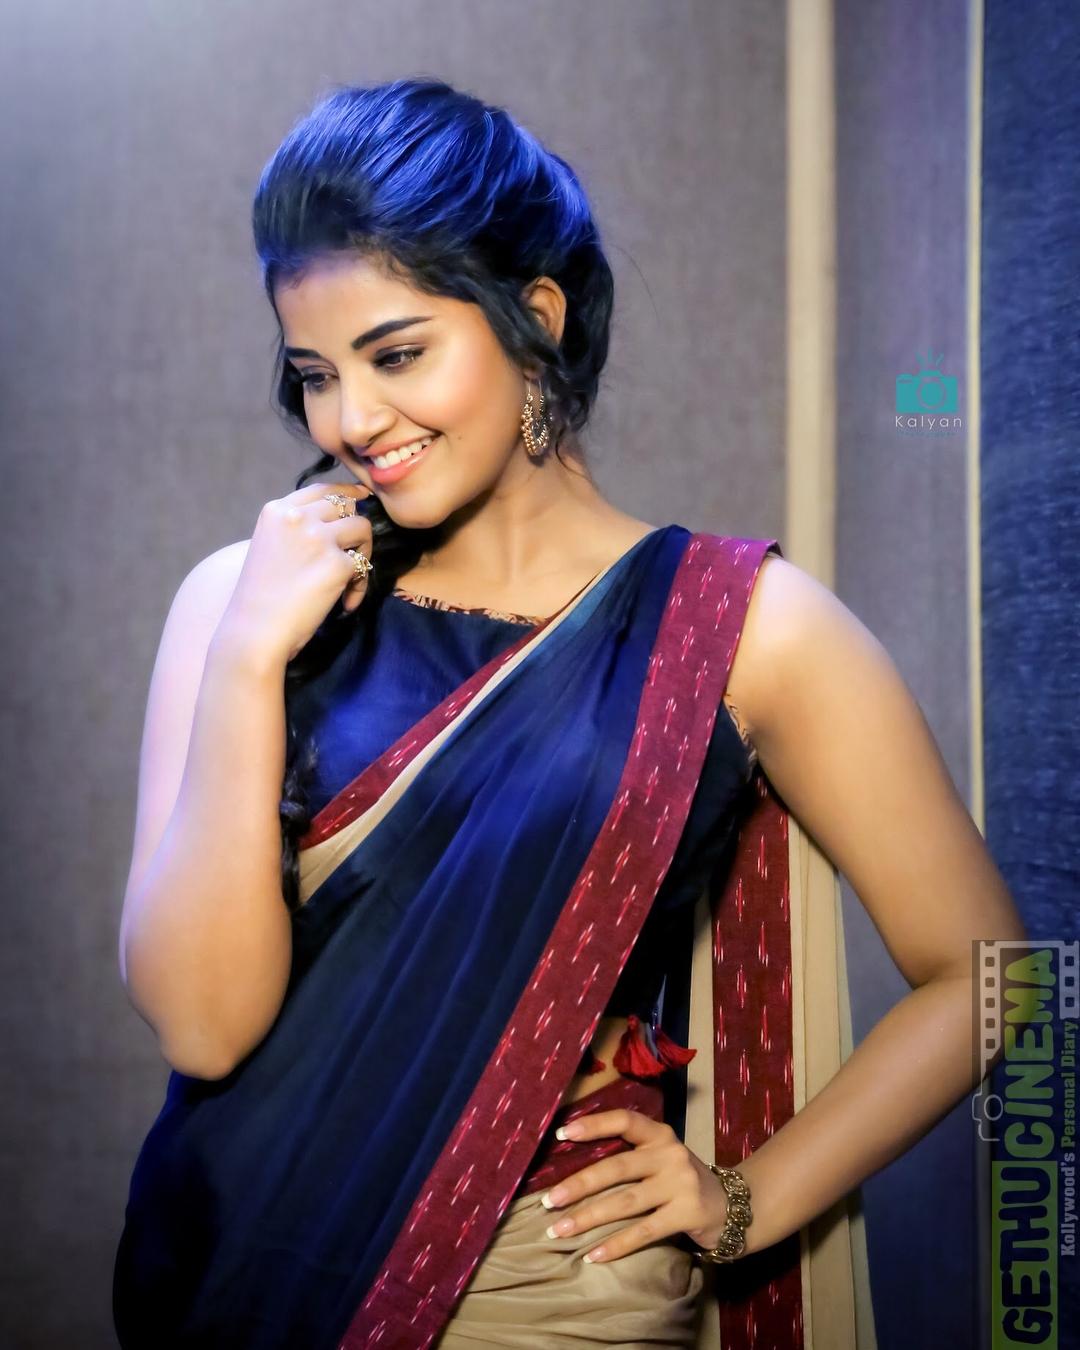 Bollywood Actress Urvashi Rautela Hot HD Images Wallpapers